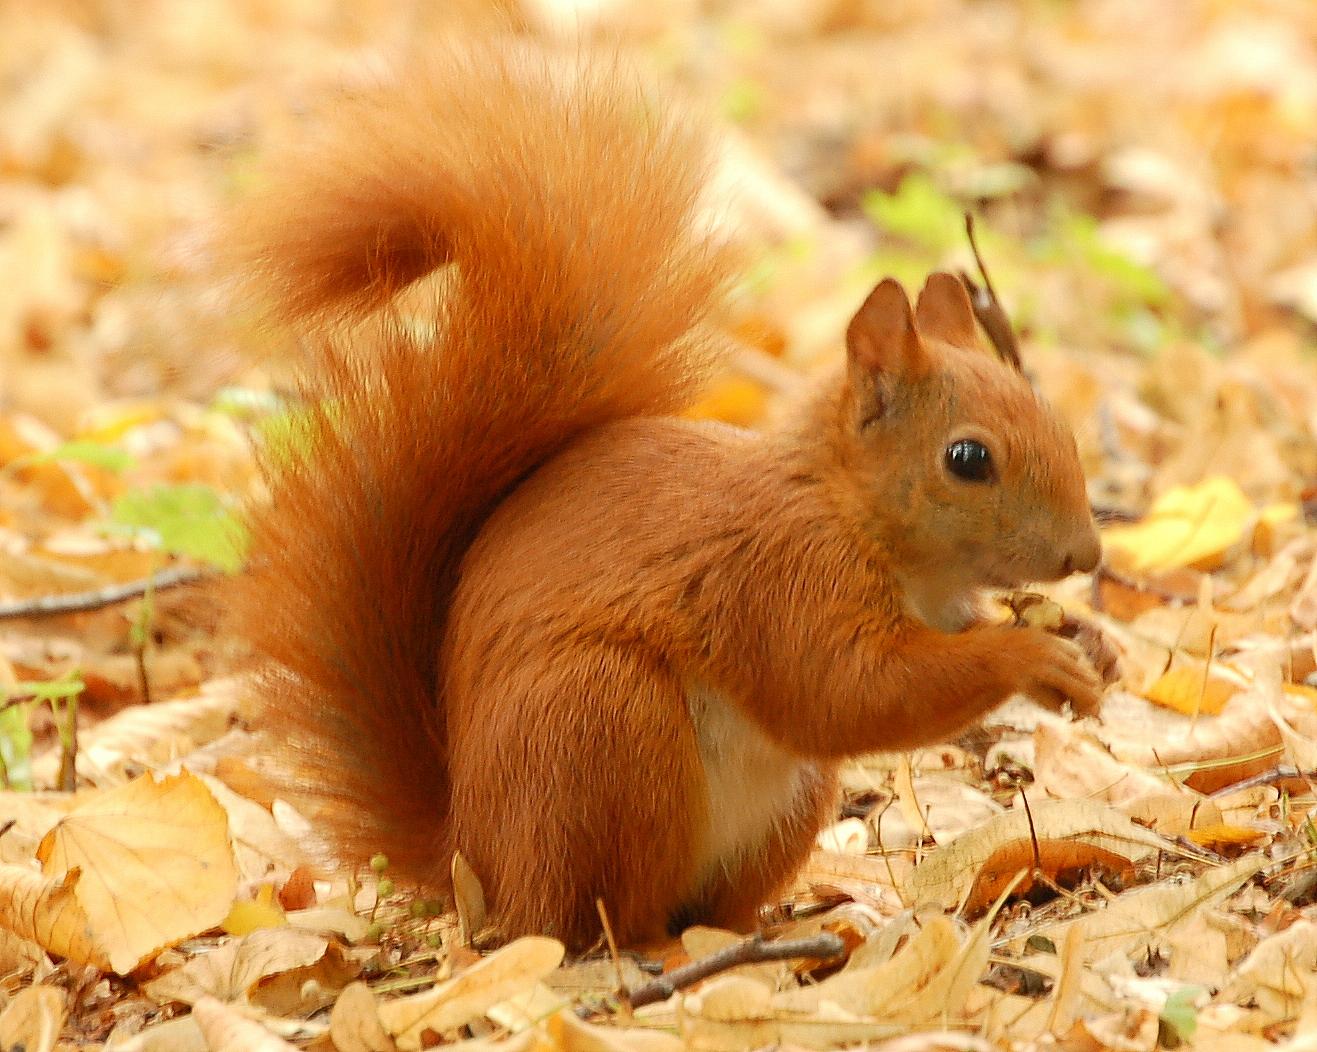 http://2.bp.blogspot.com/-O3wfESonMjY/T2NOcmQznFI/AAAAAAAAAWM/WOHVnvjMGYI/s1600/Red_Squirrel2.jpg